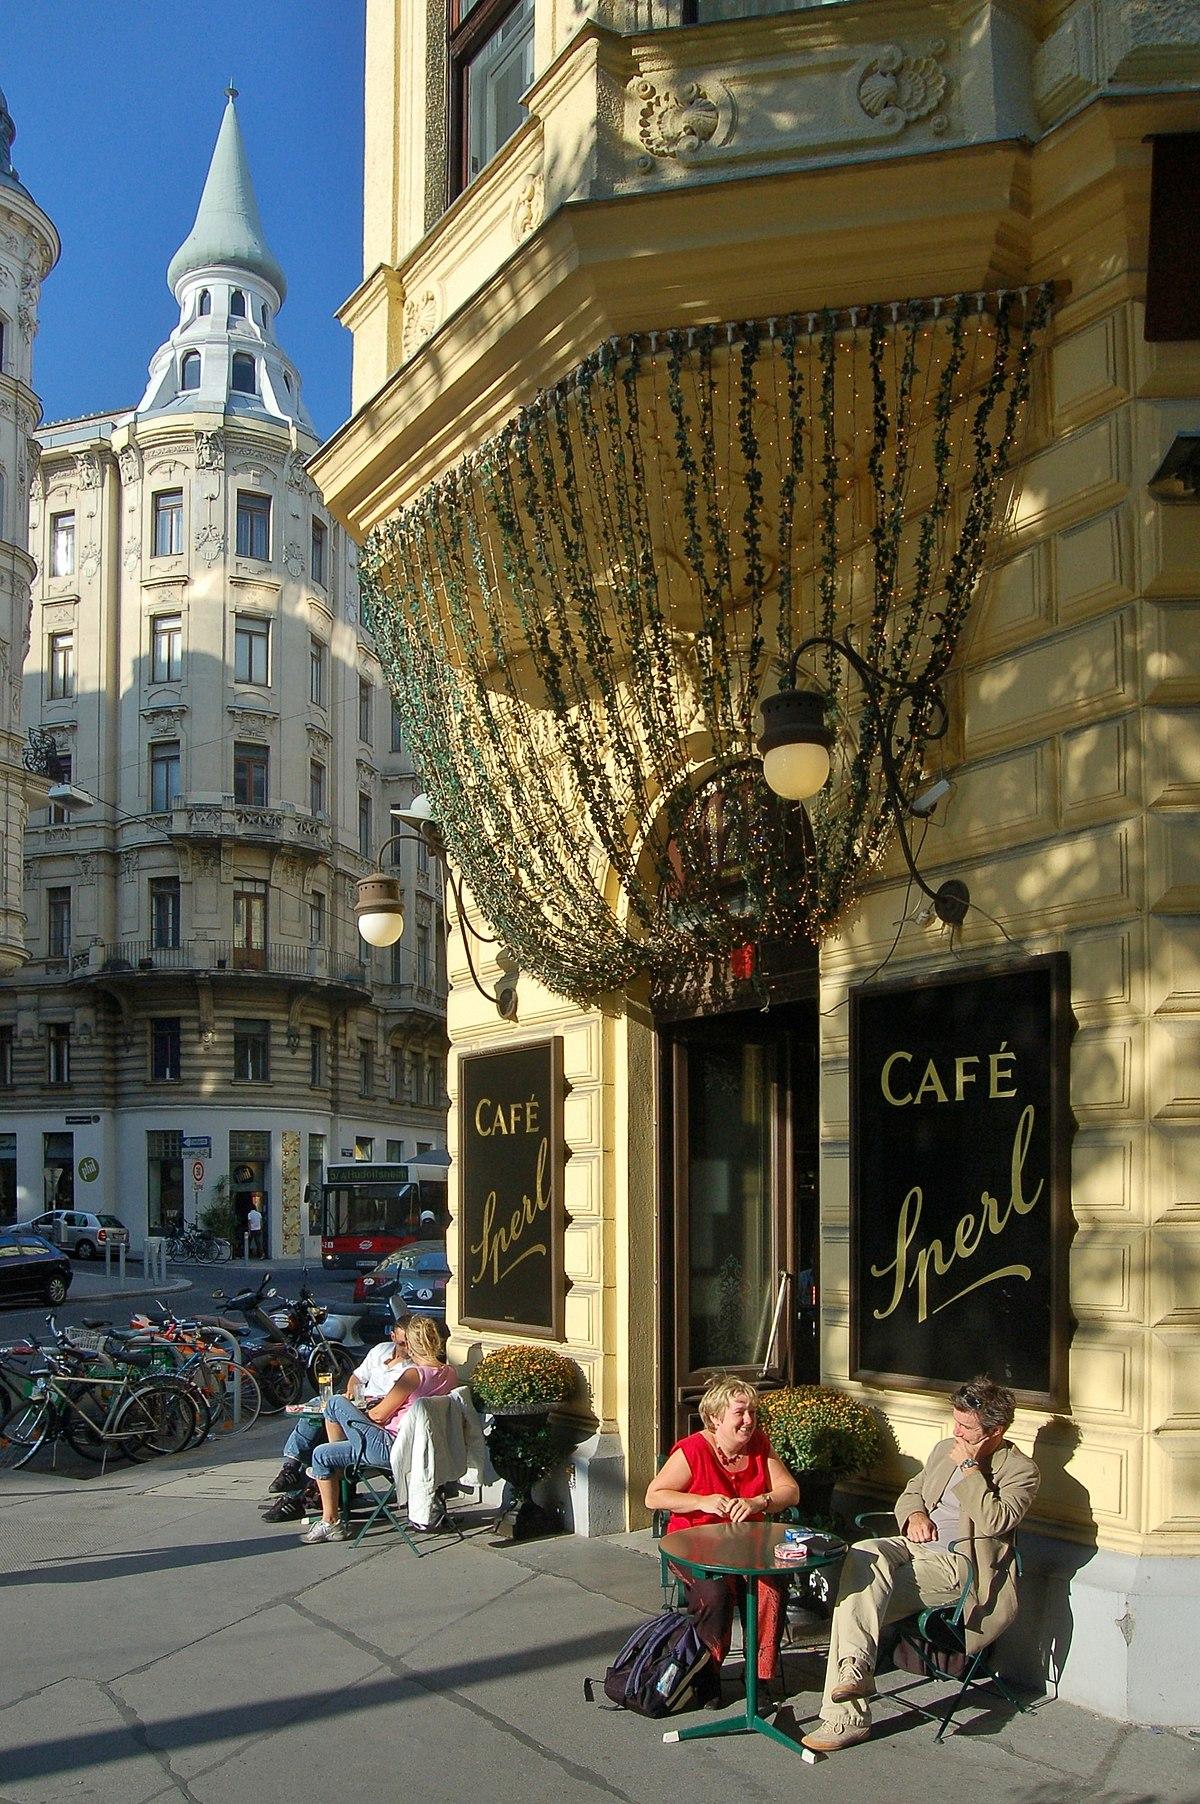 Cafe Sperl Wien Anreise